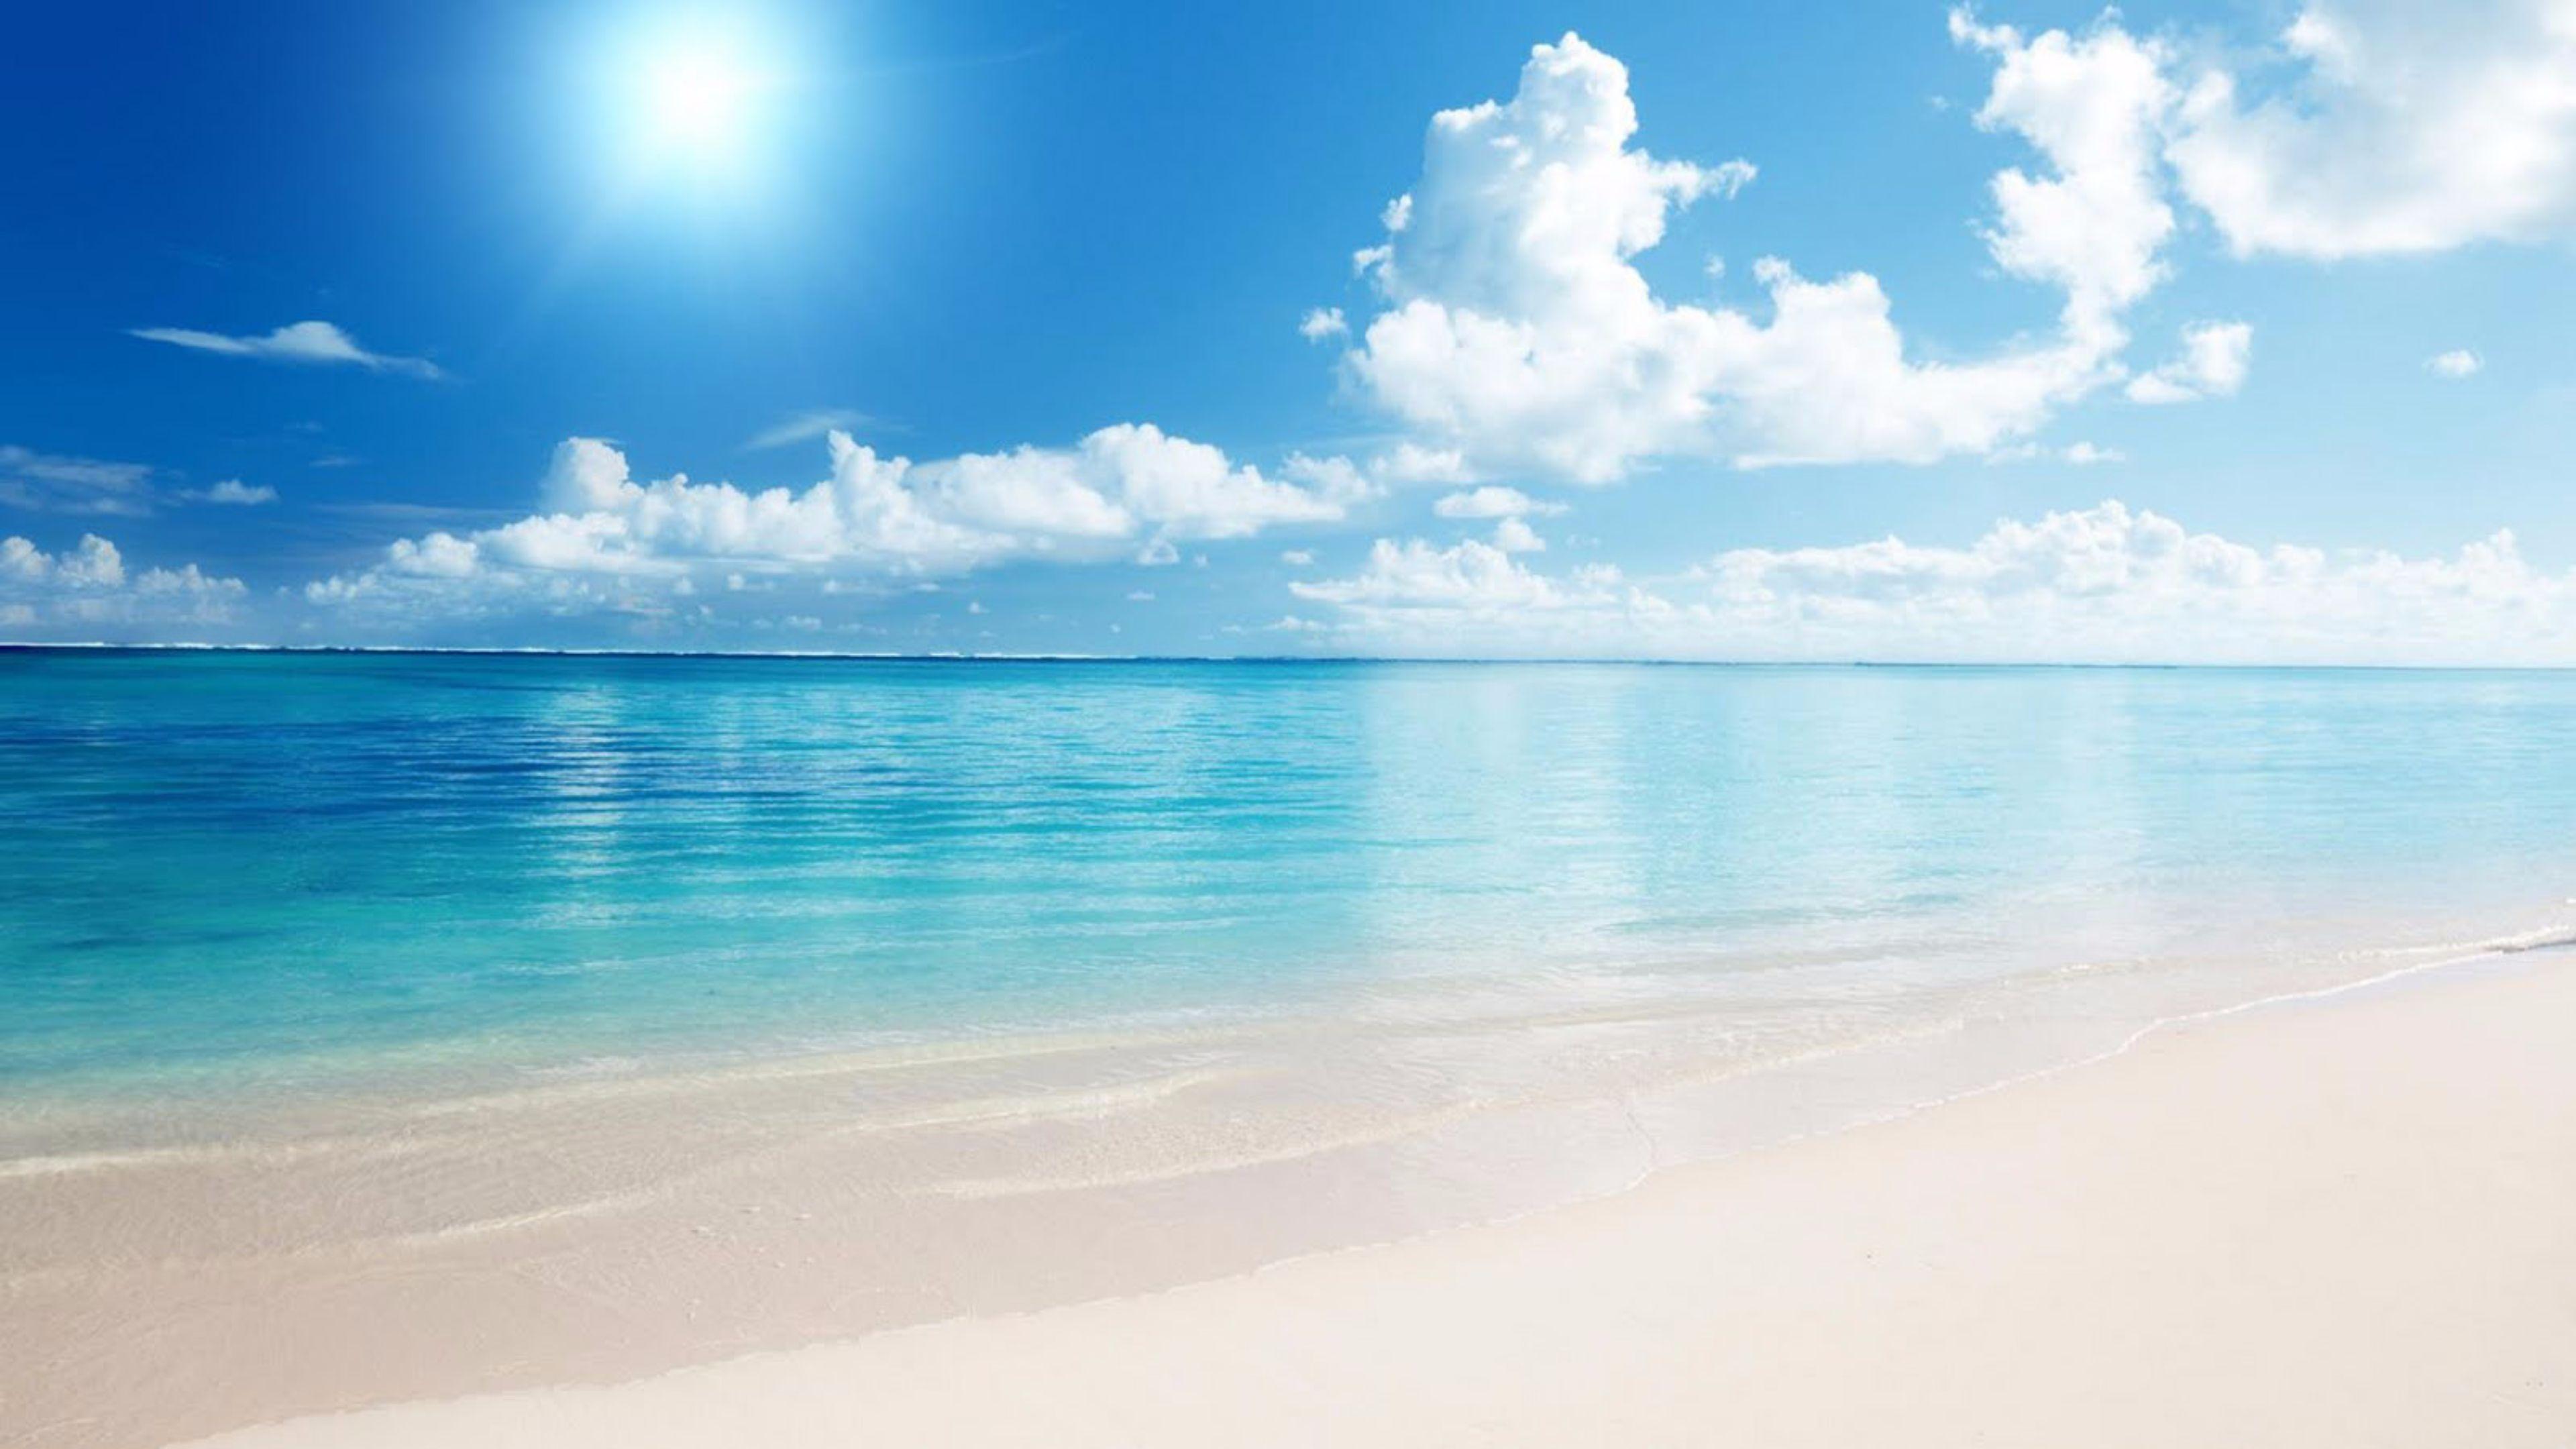 Free Download Sun Up On The Beach 4k Wallpaper 4k Wallpaper